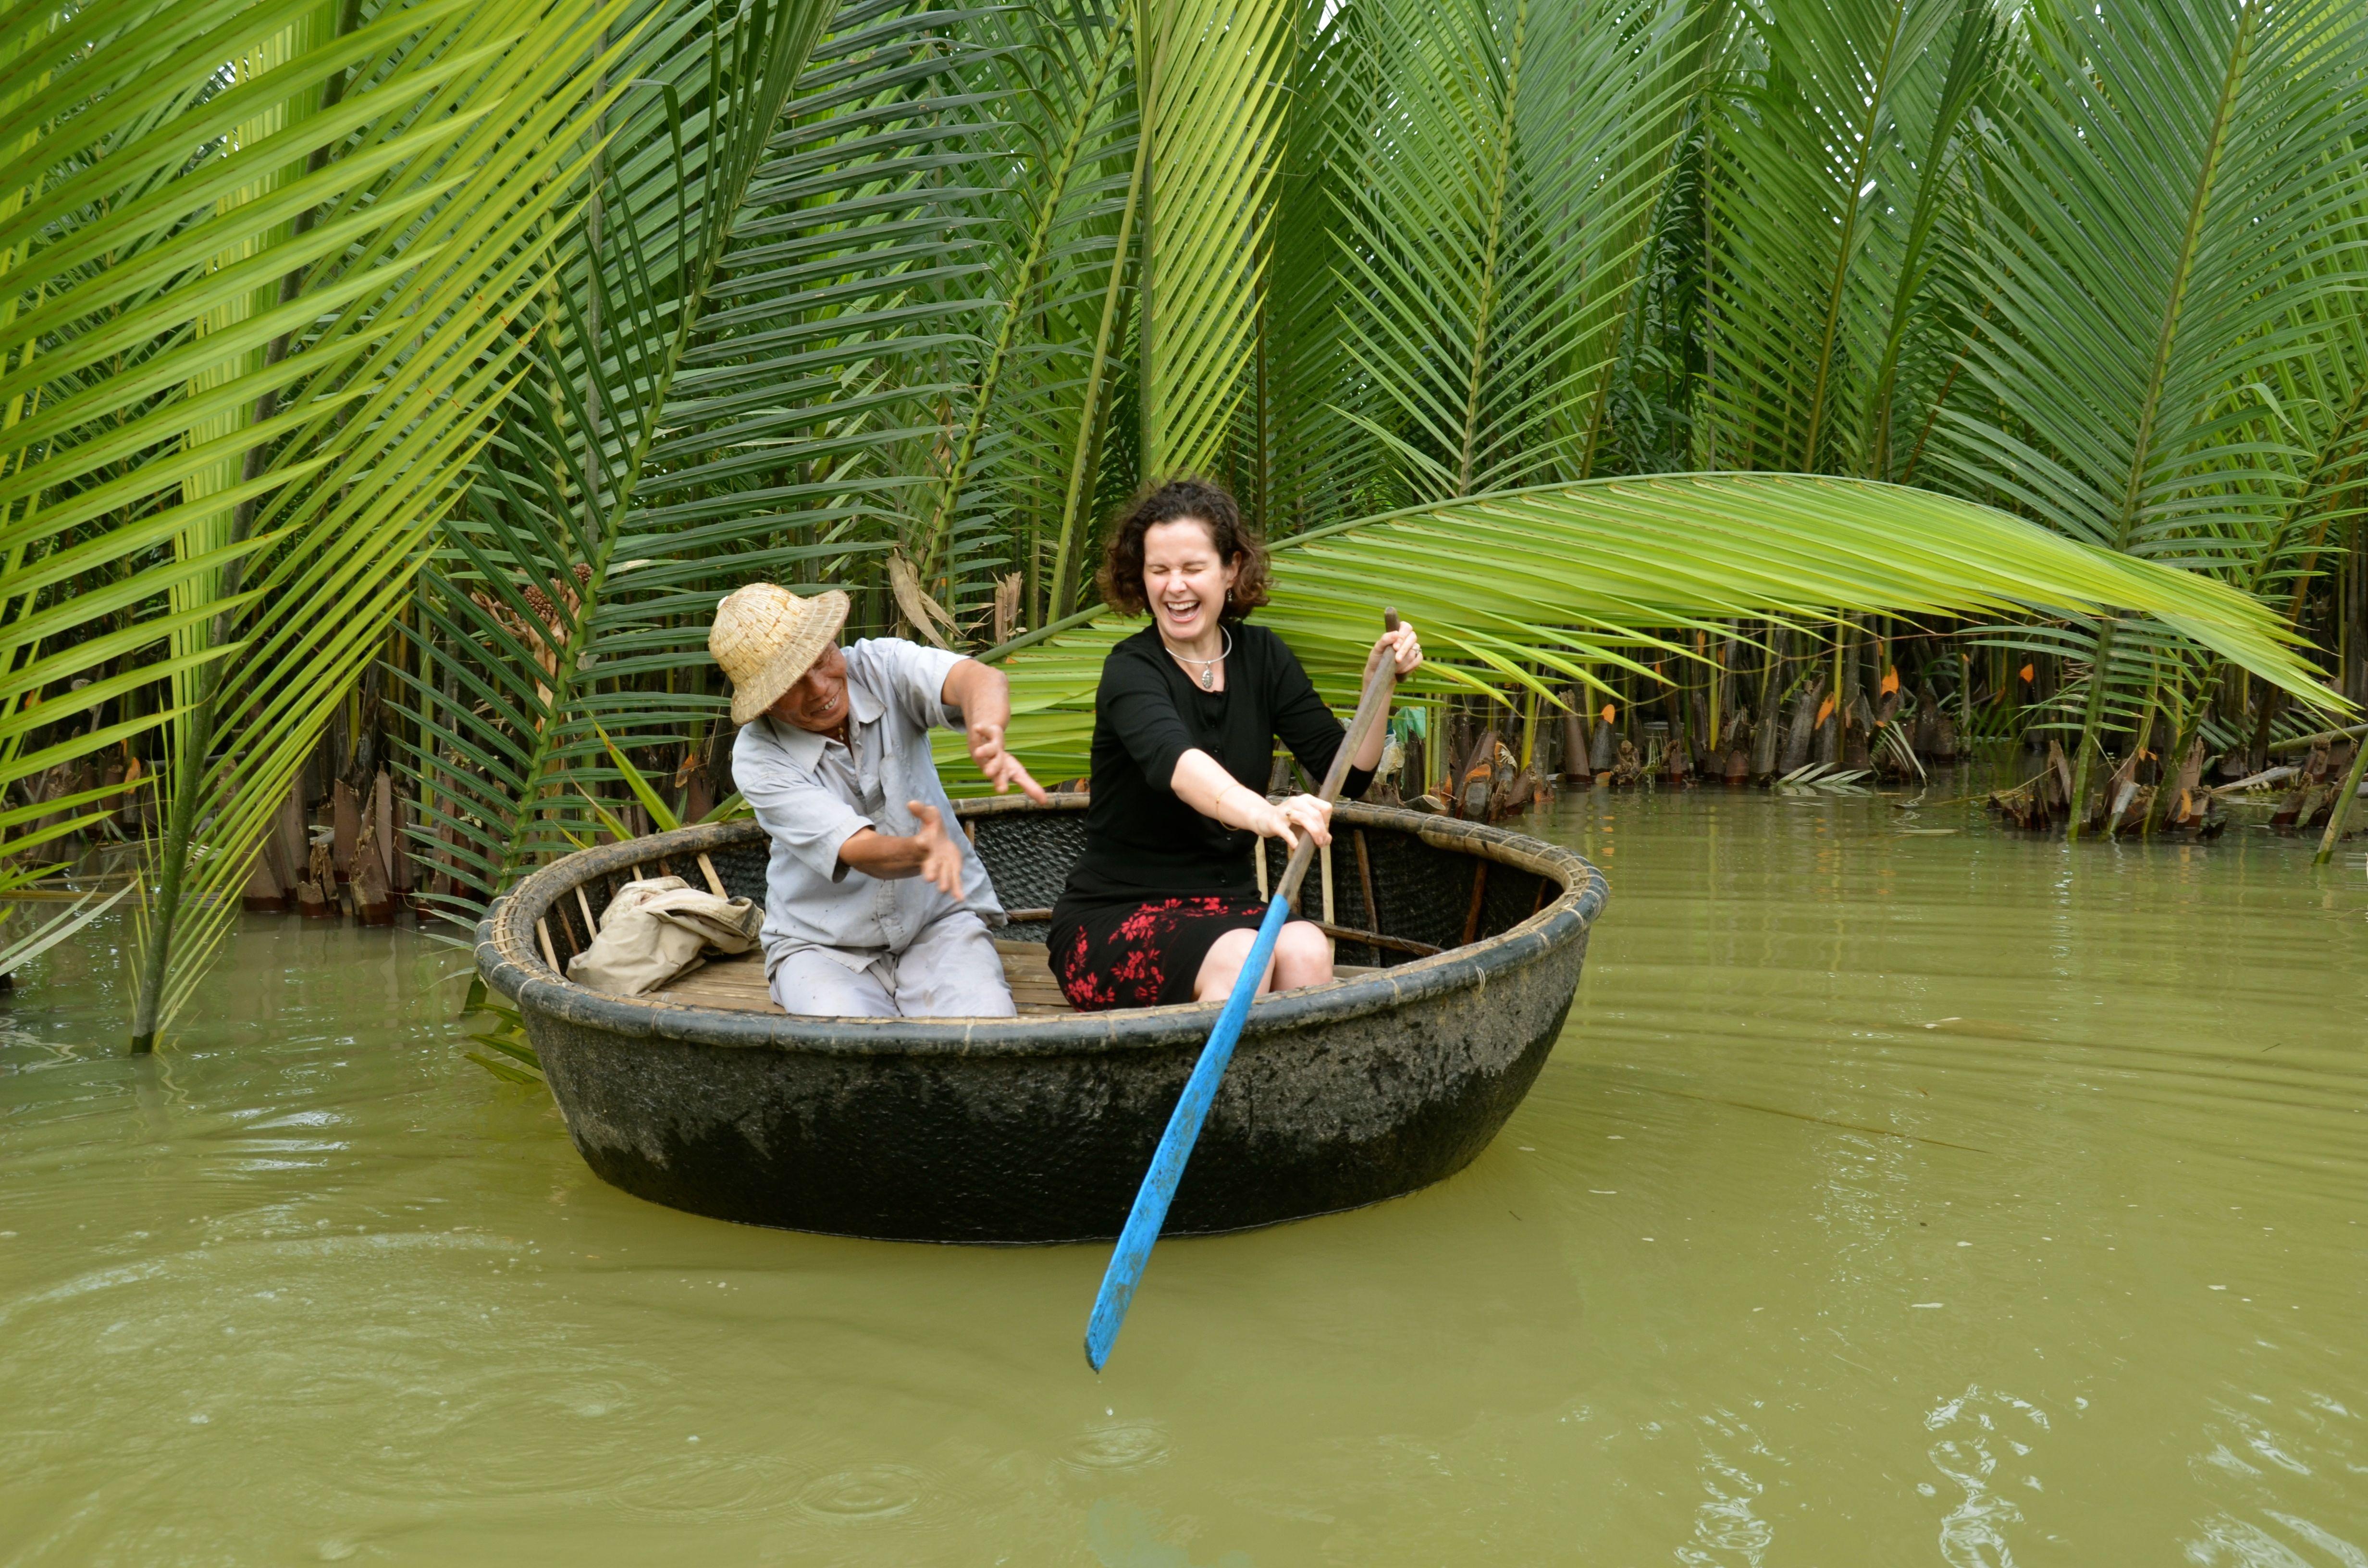 Basket Boats, Chinese Fishing Nets & Non La Hats: A Thu Bon River Boat Ride From Hoi An, Vietnam